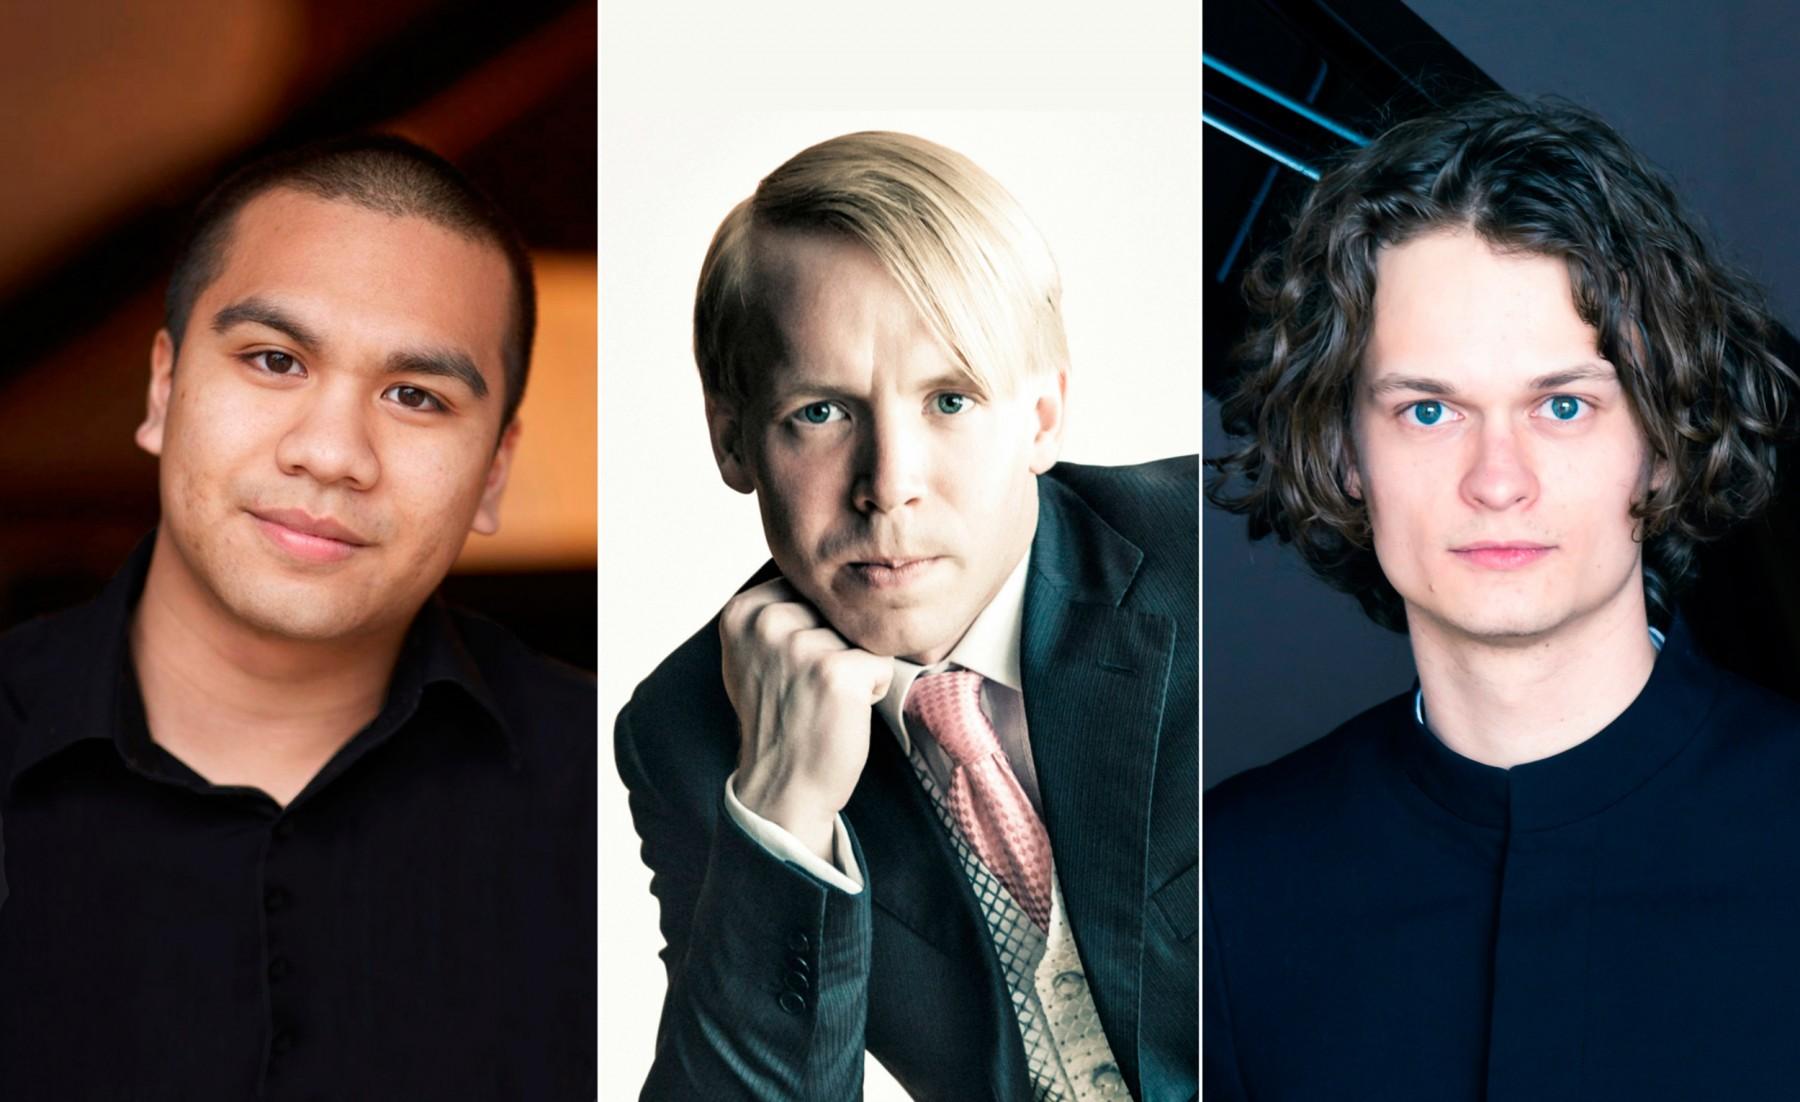 Gustav Piekut (photo McKenzie) Emil Gryesten Jensen (photo McKenzie) og Jonathan Siahaan